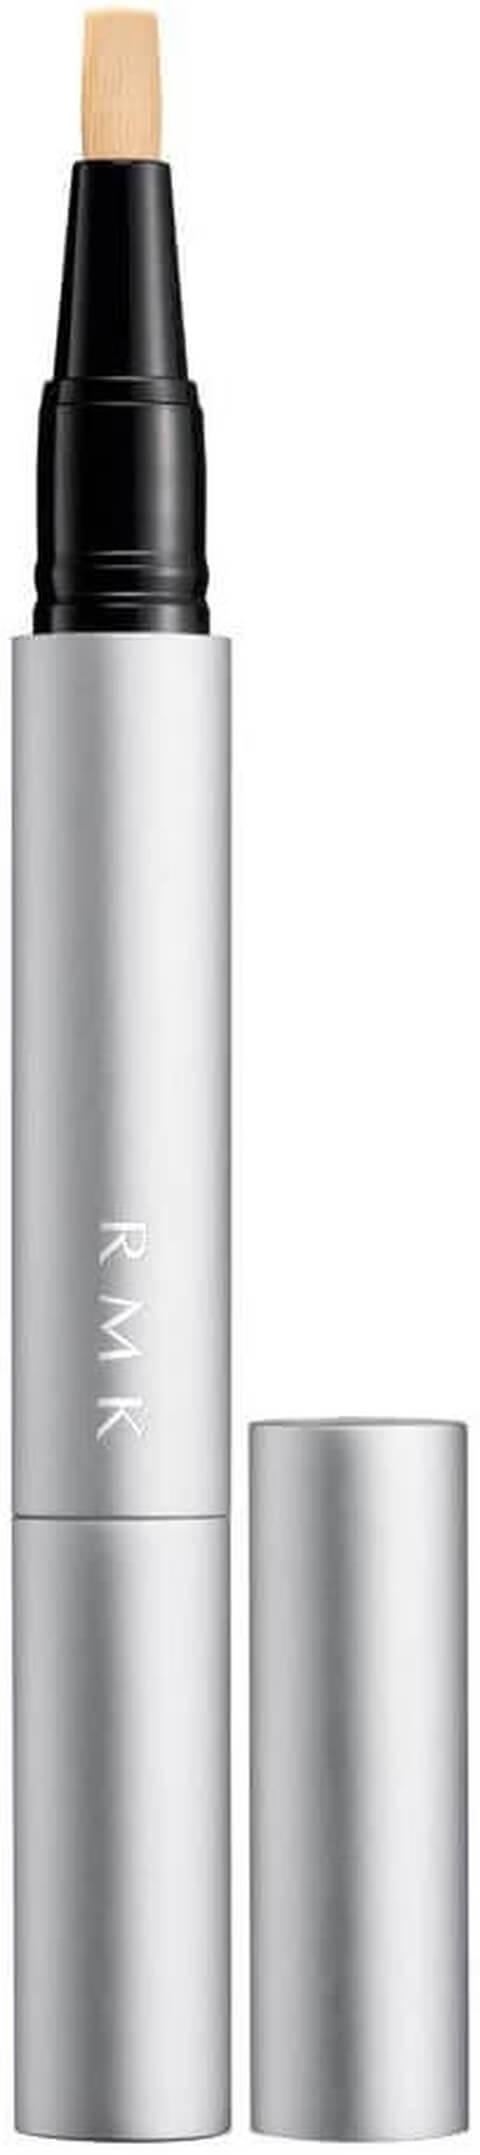 RMK ベースアップメイク ルミナス ペンブラッシュコンシーラー